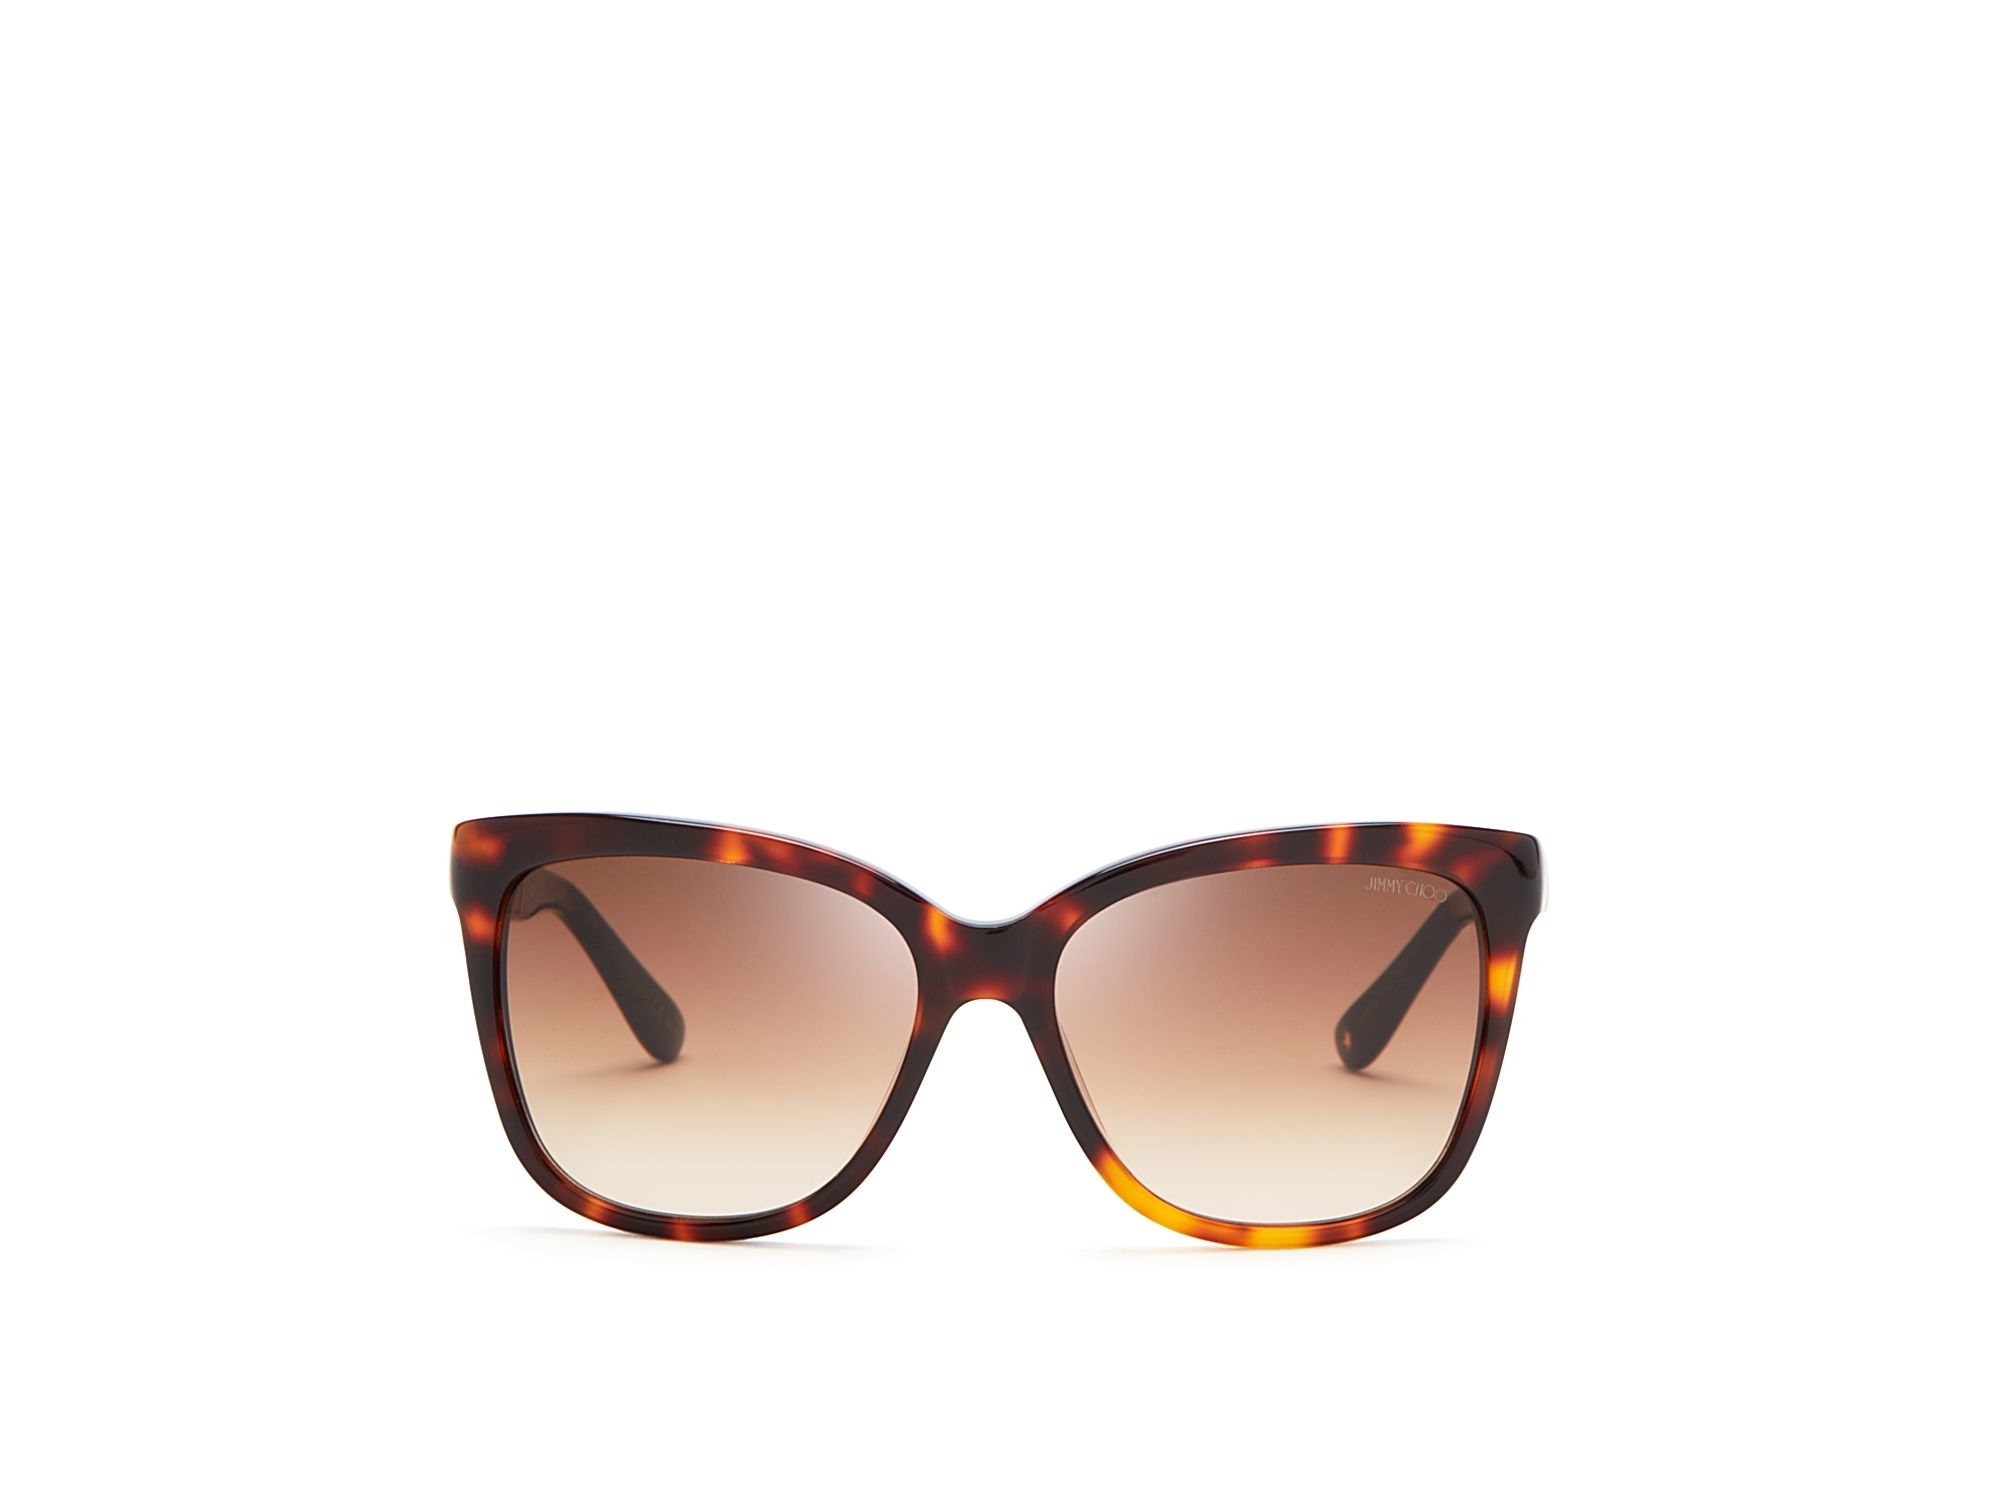 Cat Ear Sunglasses Dolce And Gabbana